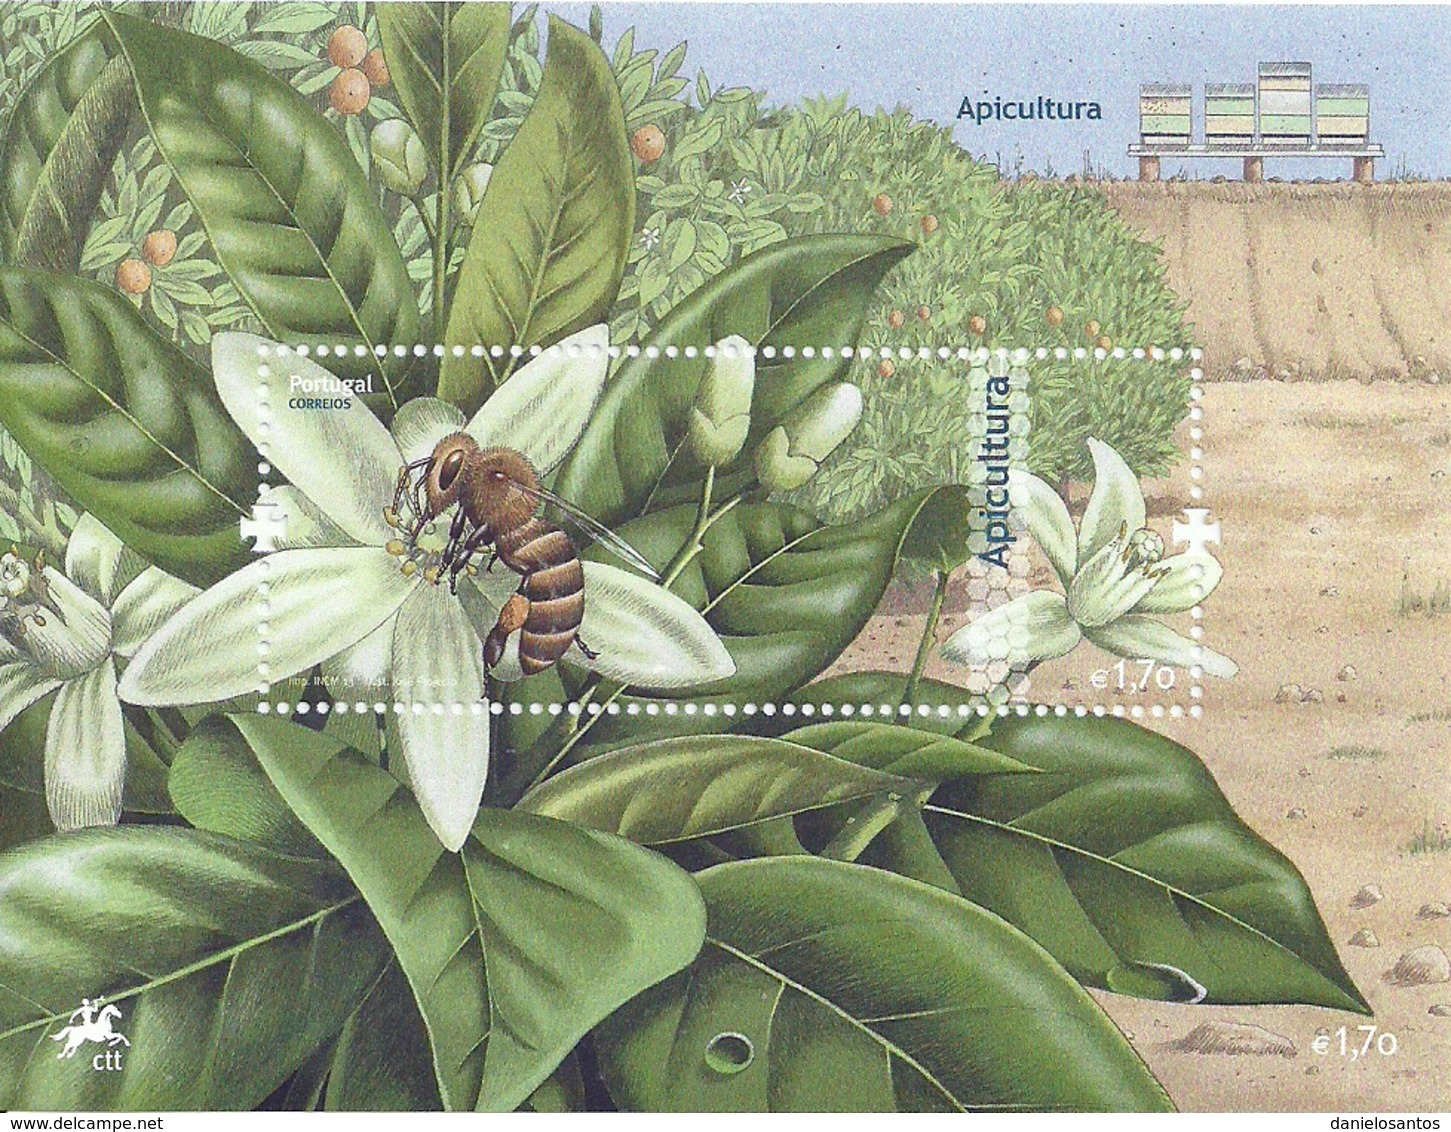 Portugal 2013 Apiculture Bees Honeycomb Souvenir Sheet MNH - Factories & Industries